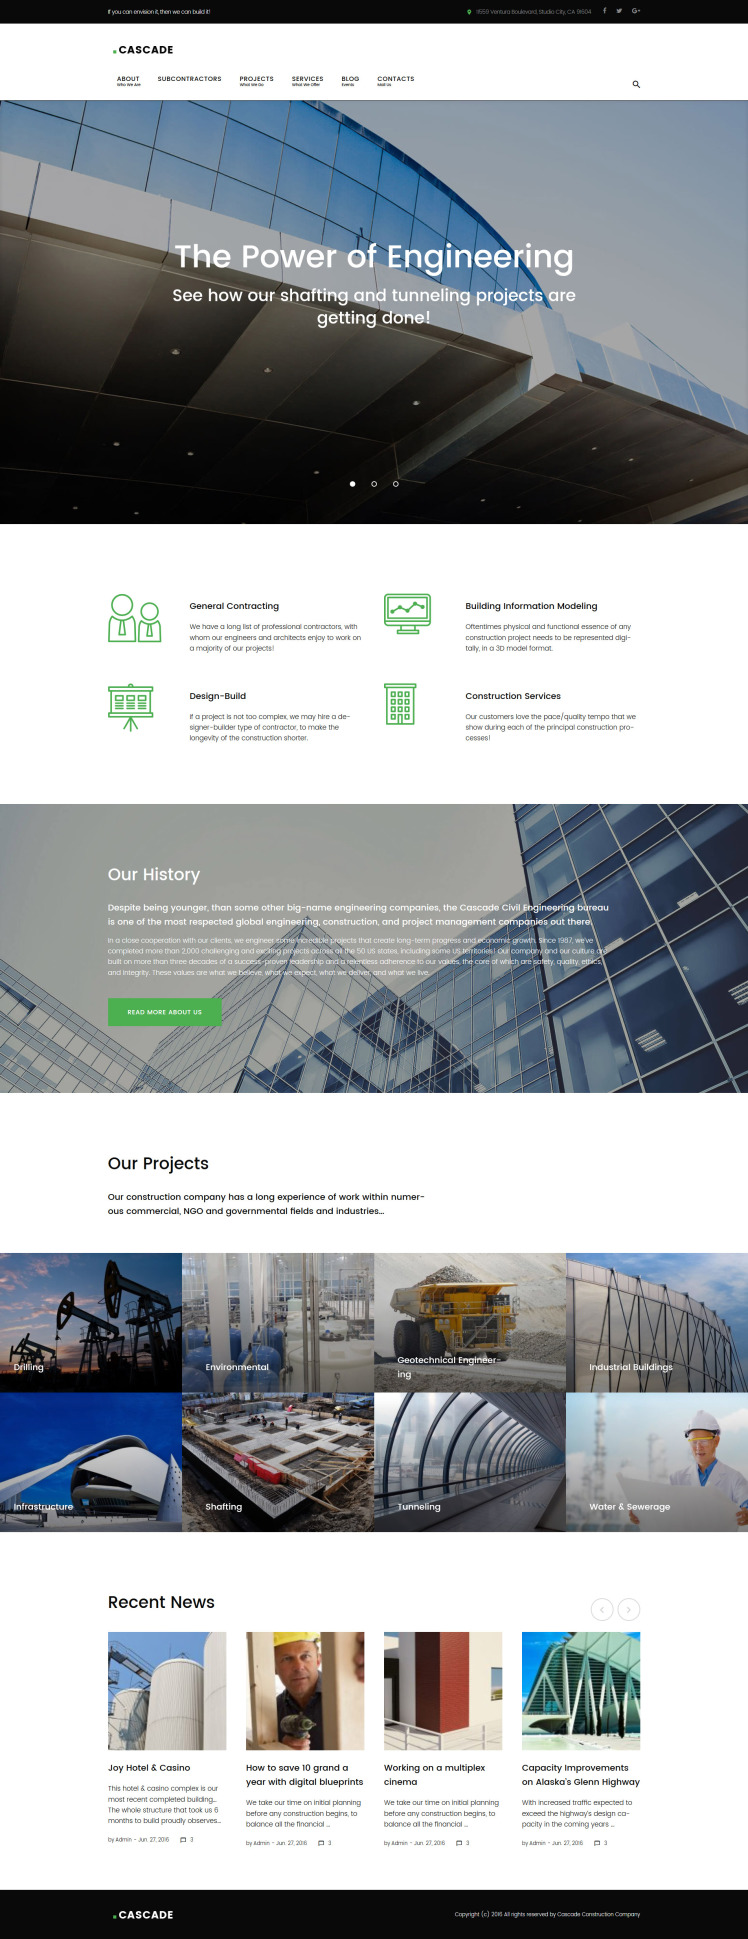 Cascade civil engineering and constructions company WordPress Theme